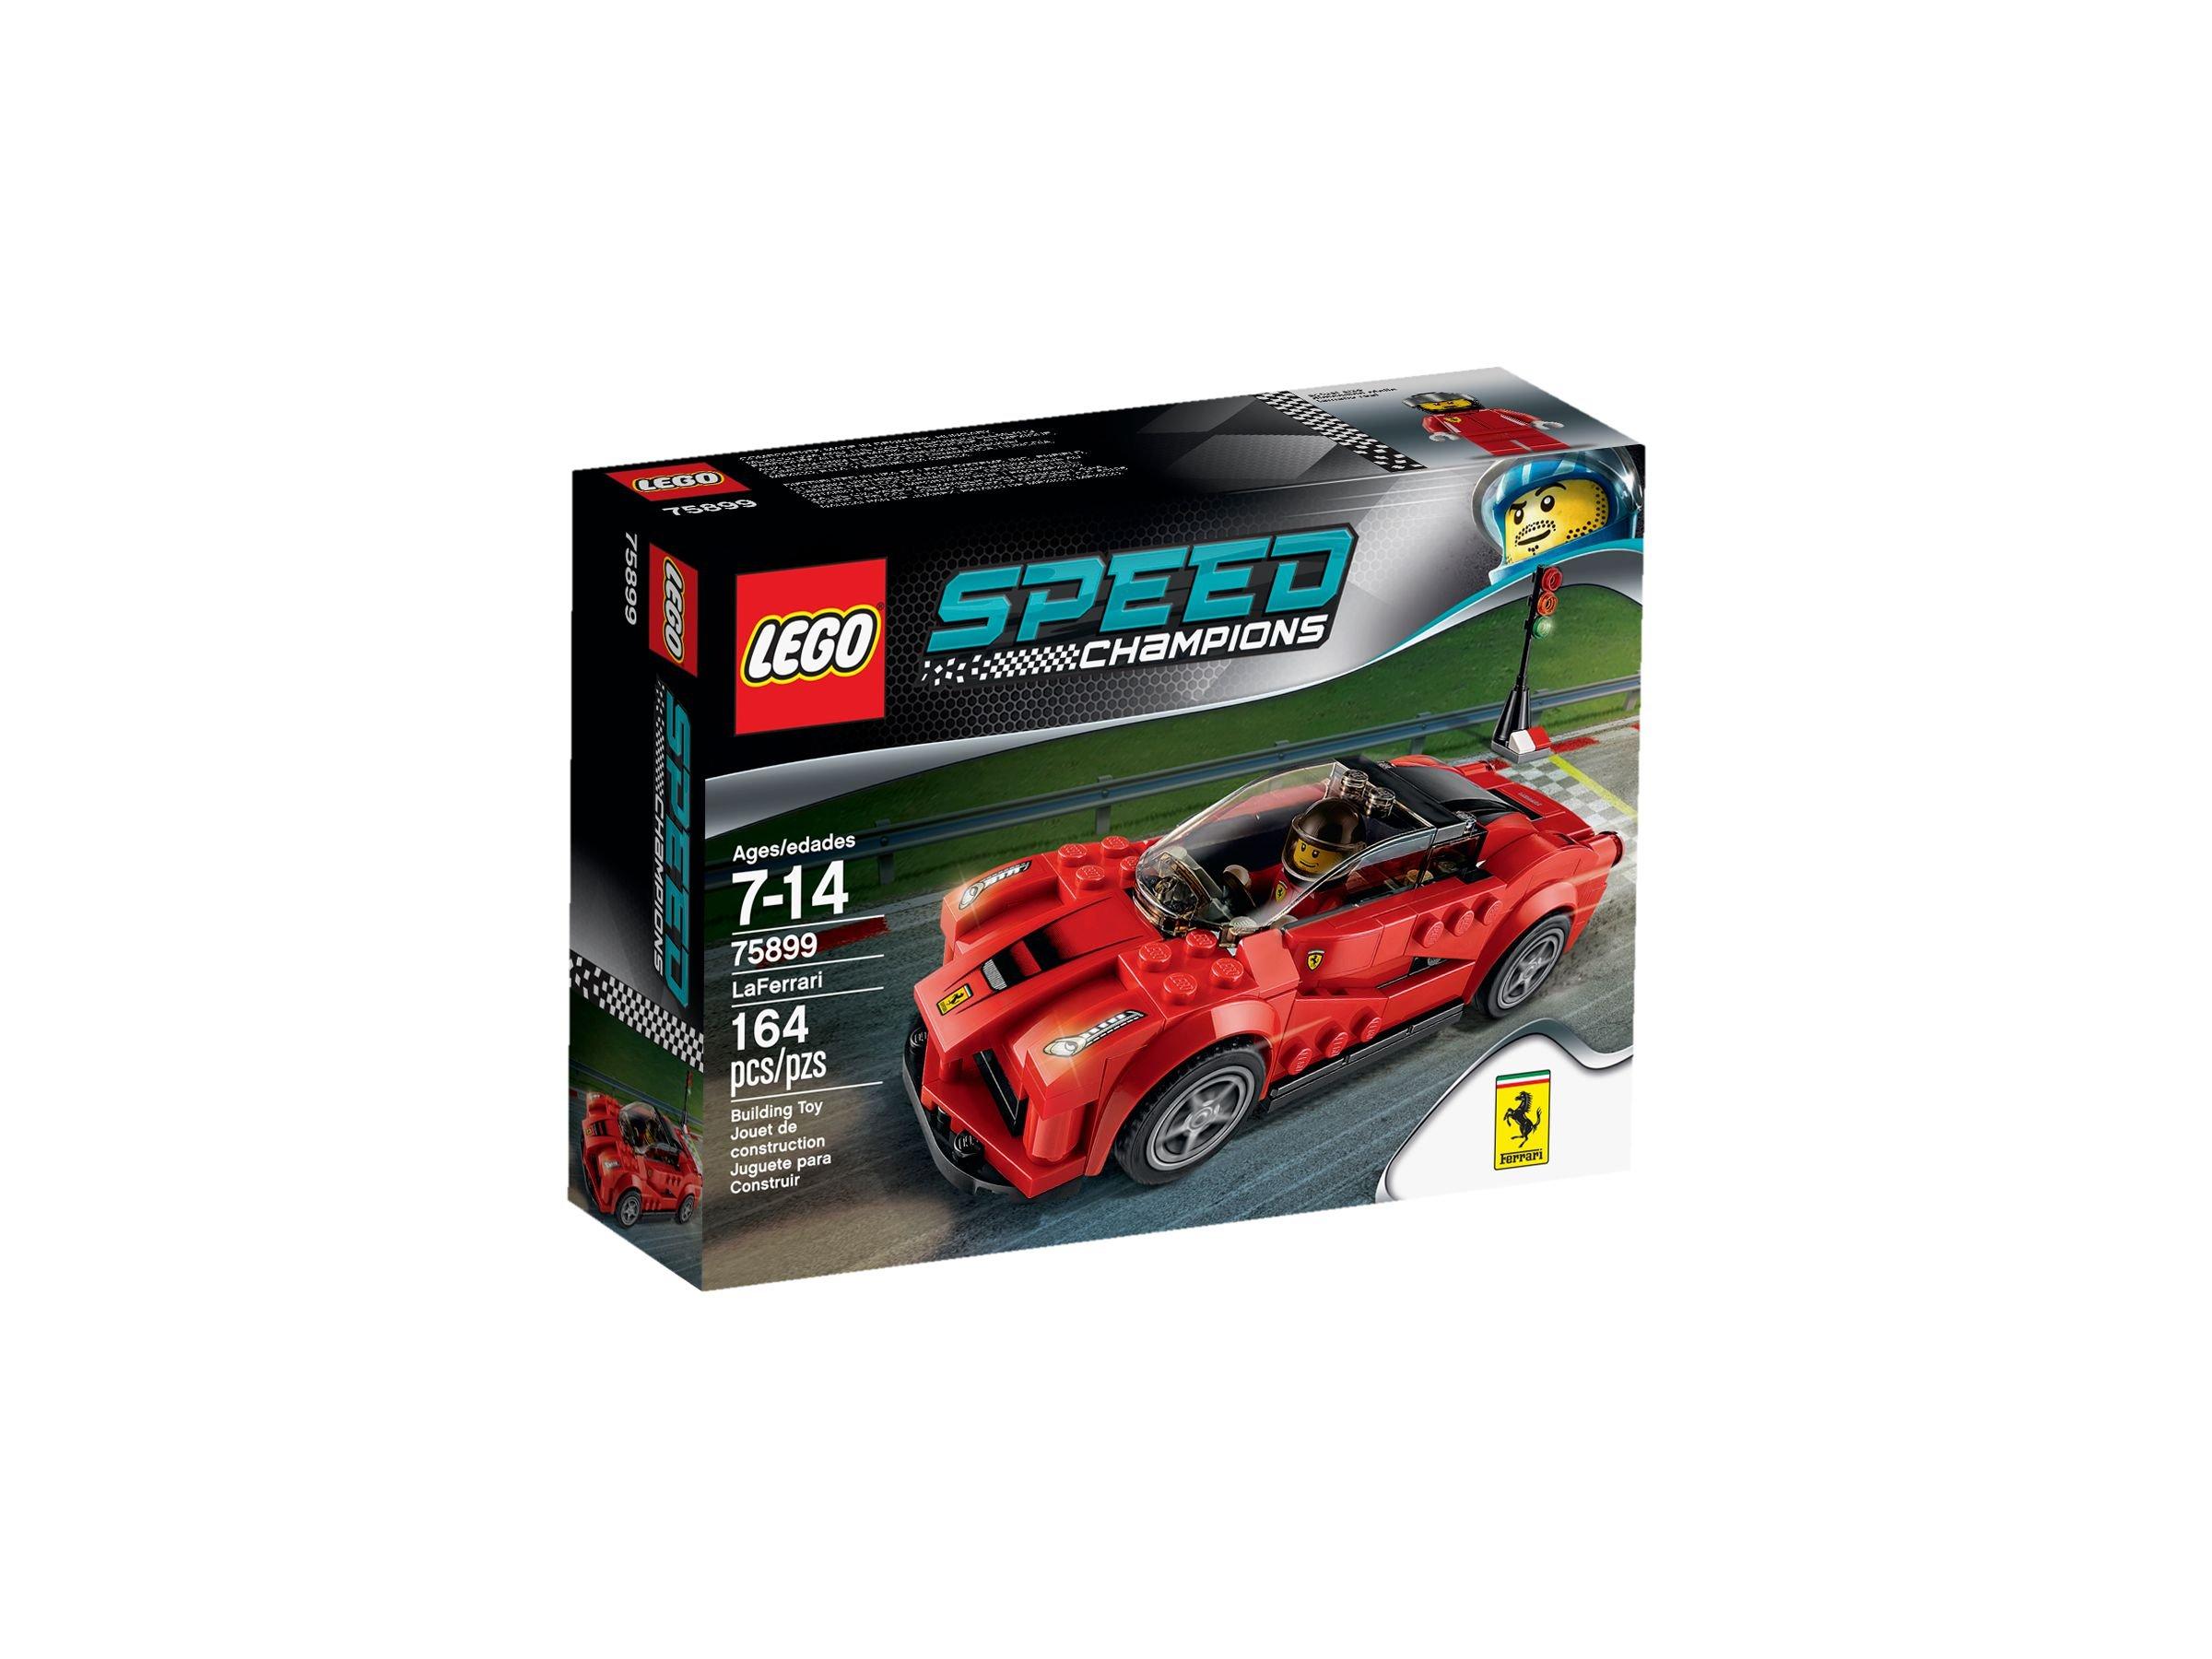 lego 75899 laferrari speed champions 2015 brickmerge. Black Bedroom Furniture Sets. Home Design Ideas